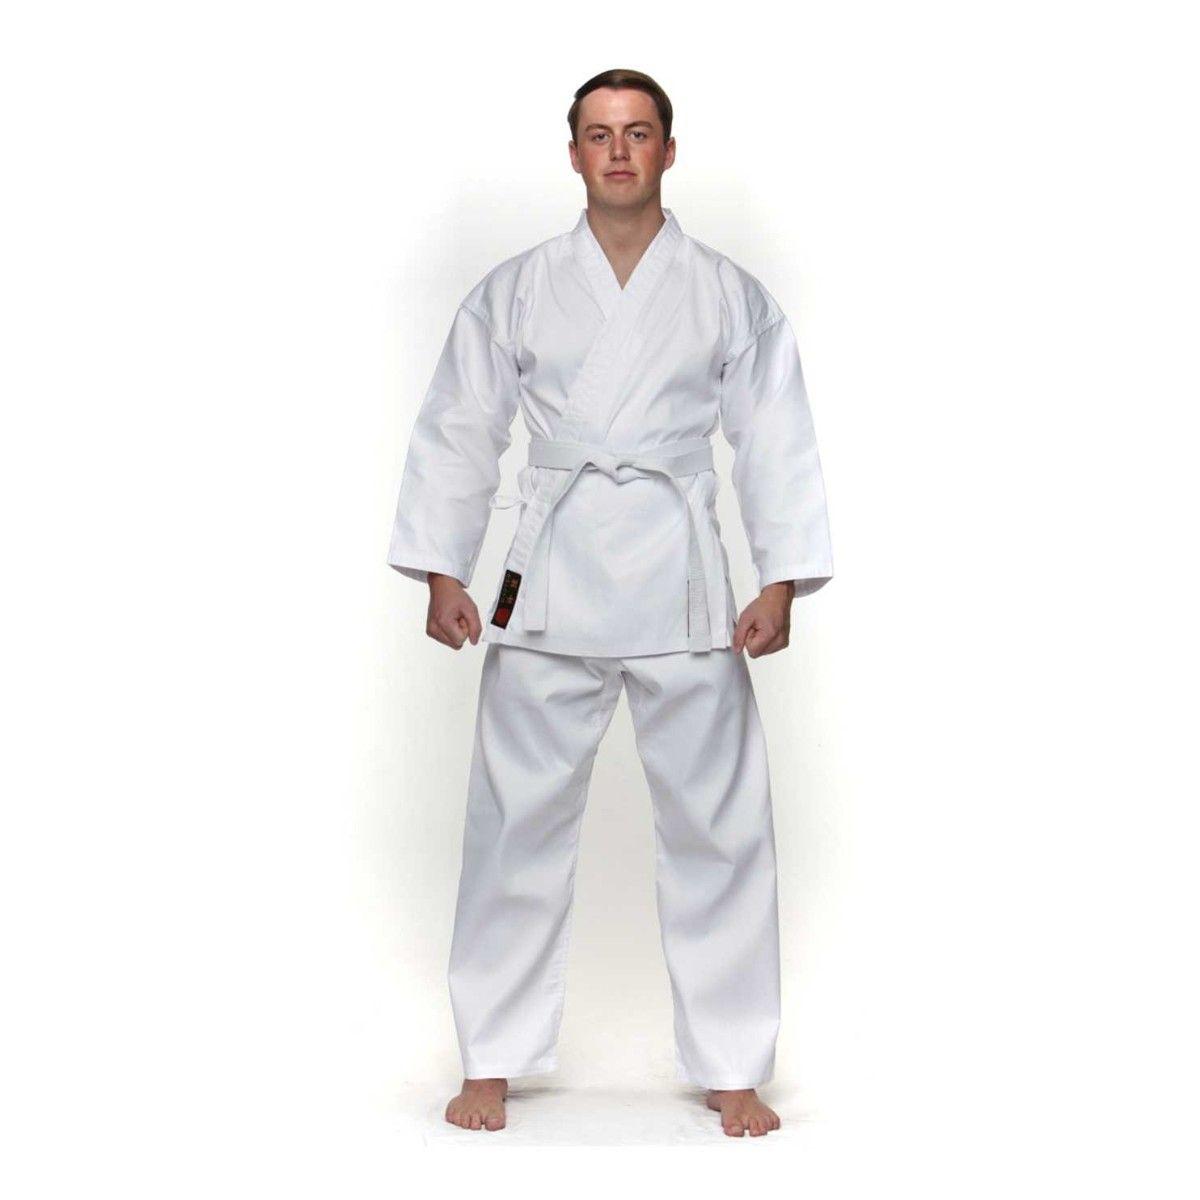 KMA - Karategi Training per allievi